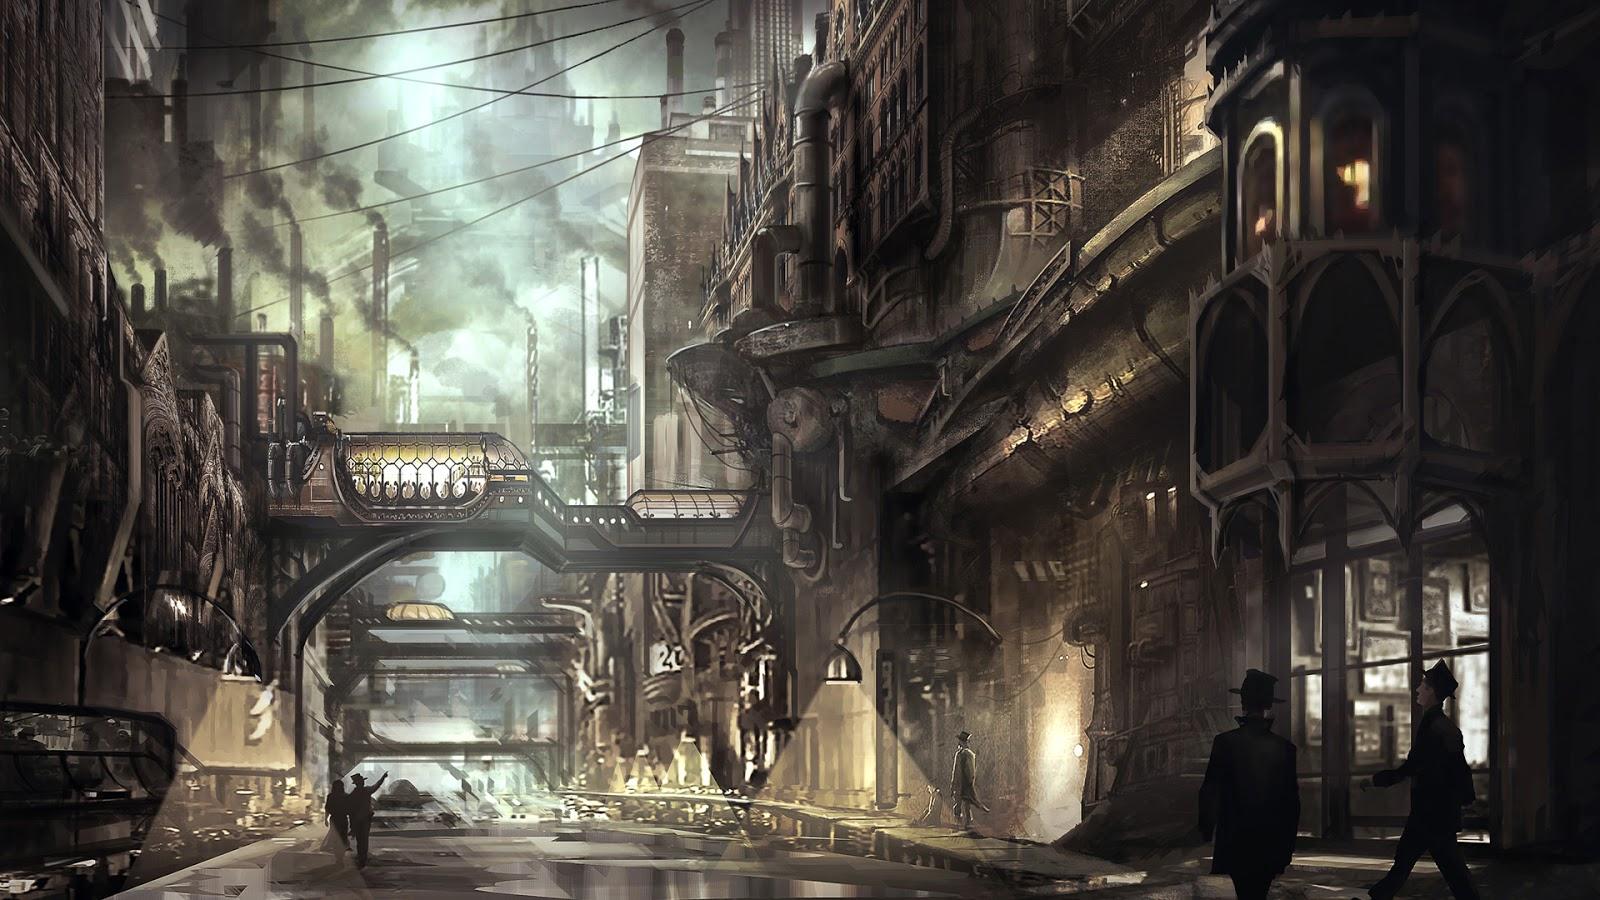 Steampunk Art In 3D Modeling - Blog | CGTrader  |Victorian Steampunk Concept Art